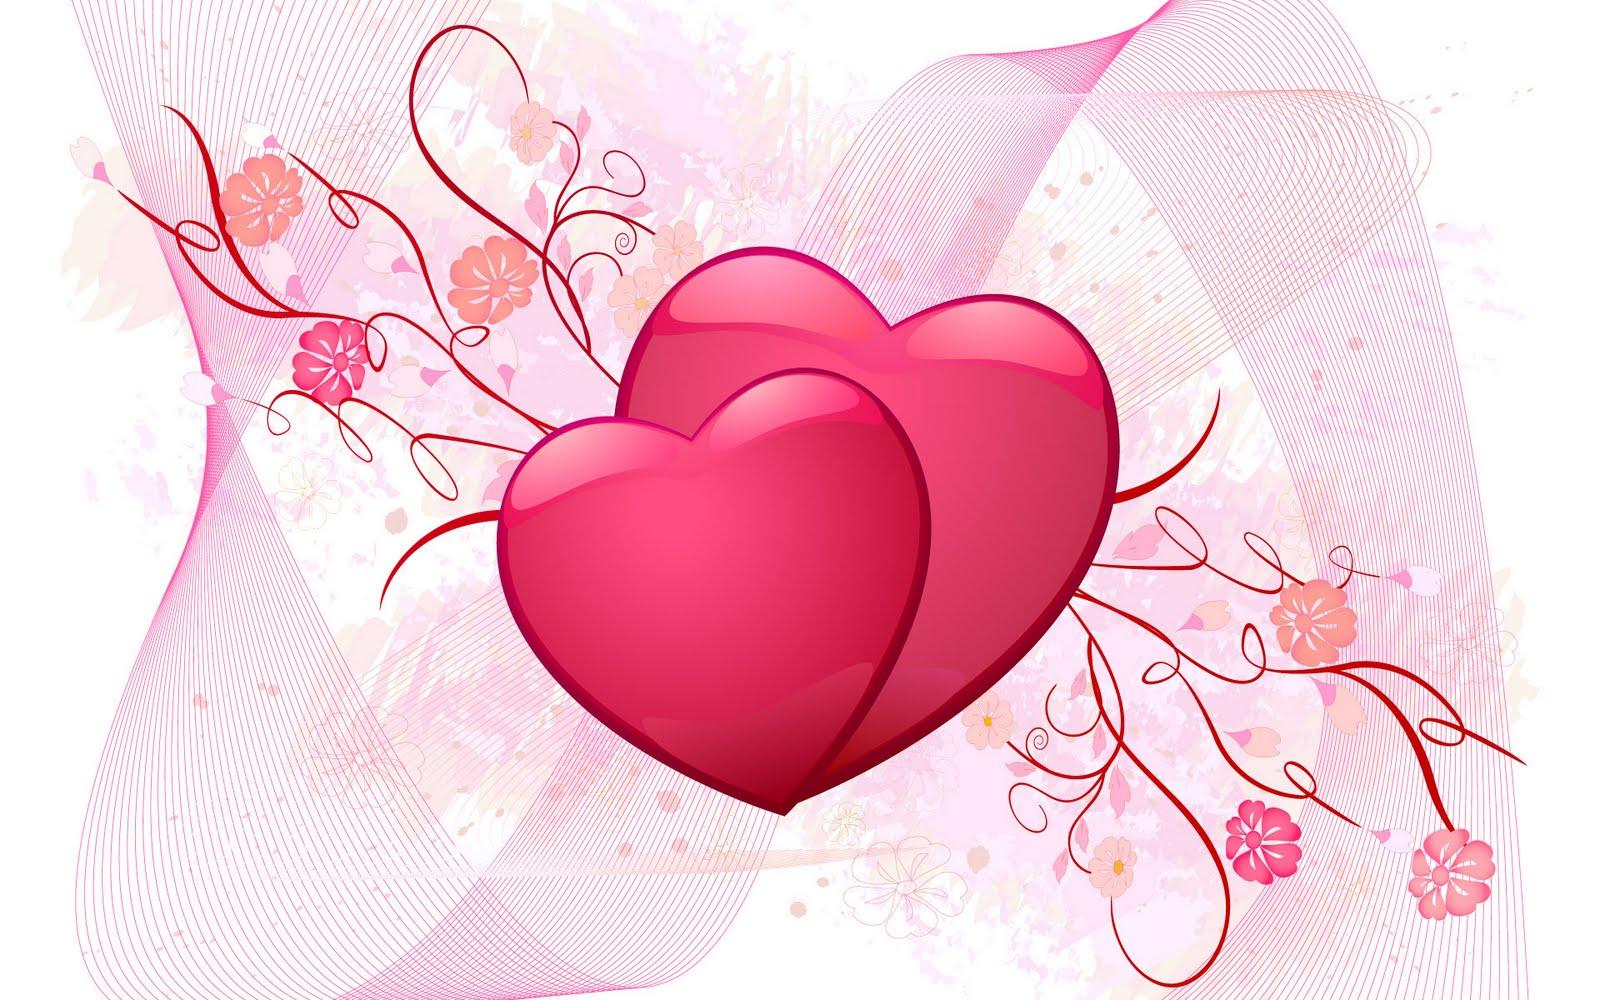 http://4.bp.blogspot.com/-ErW_zAFHtpg/TmceMCw6UJI/AAAAAAAAABY/ia50dibpMLg/s1600/Lovewallpaper%2Blove%2Bwallpapers.jpg